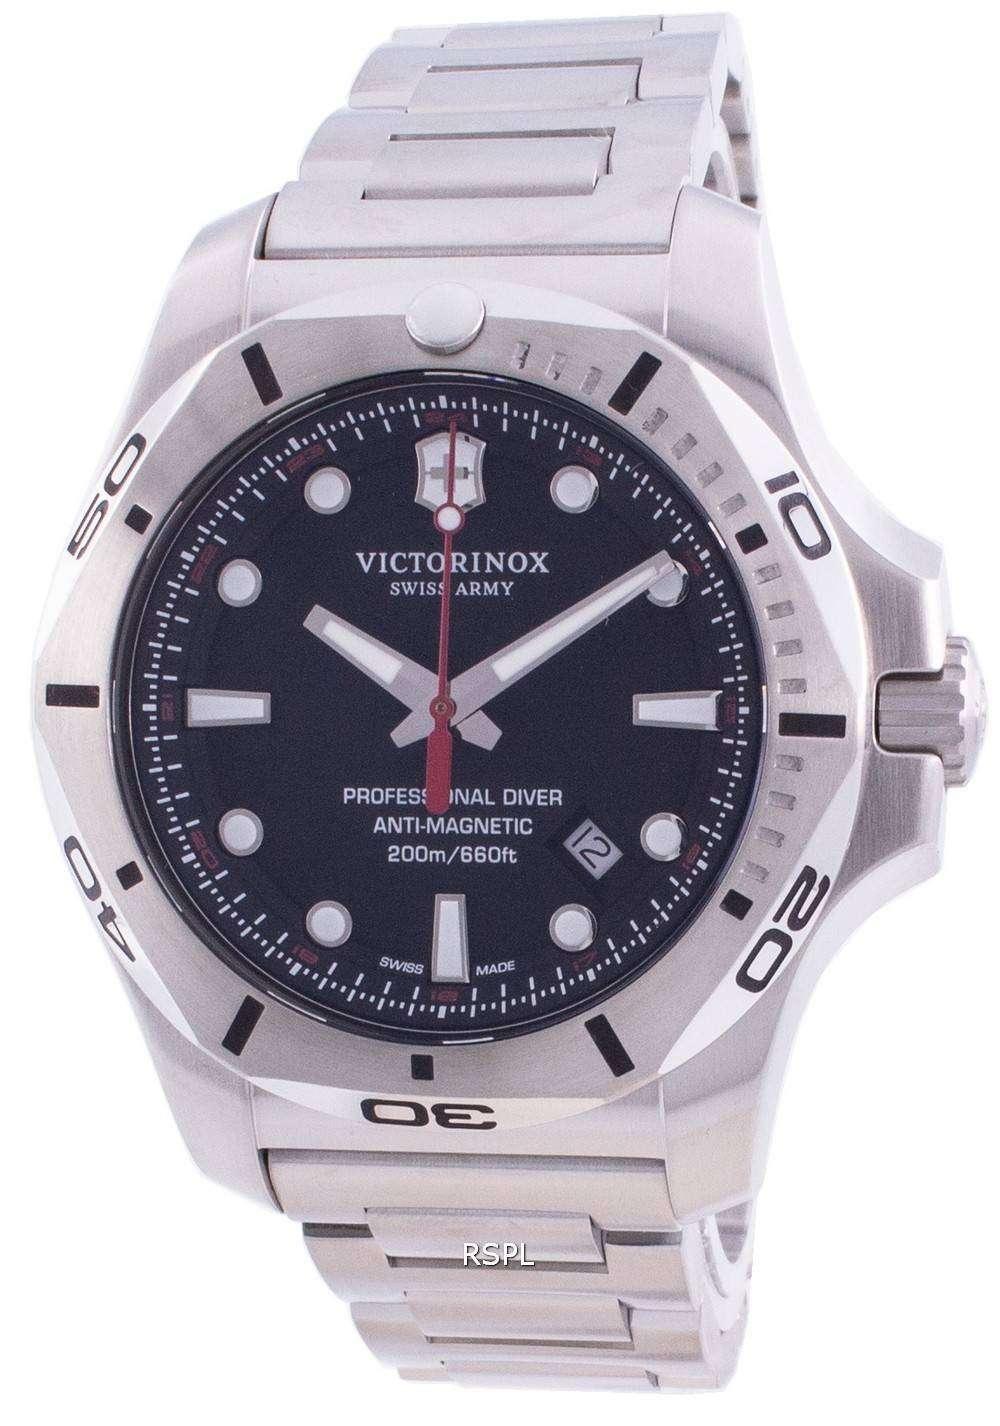 Victorinox Swiss Army I.N.O.X. Professional Diver Anti-Magnetic 241781 Quartz 200M Men's Watch